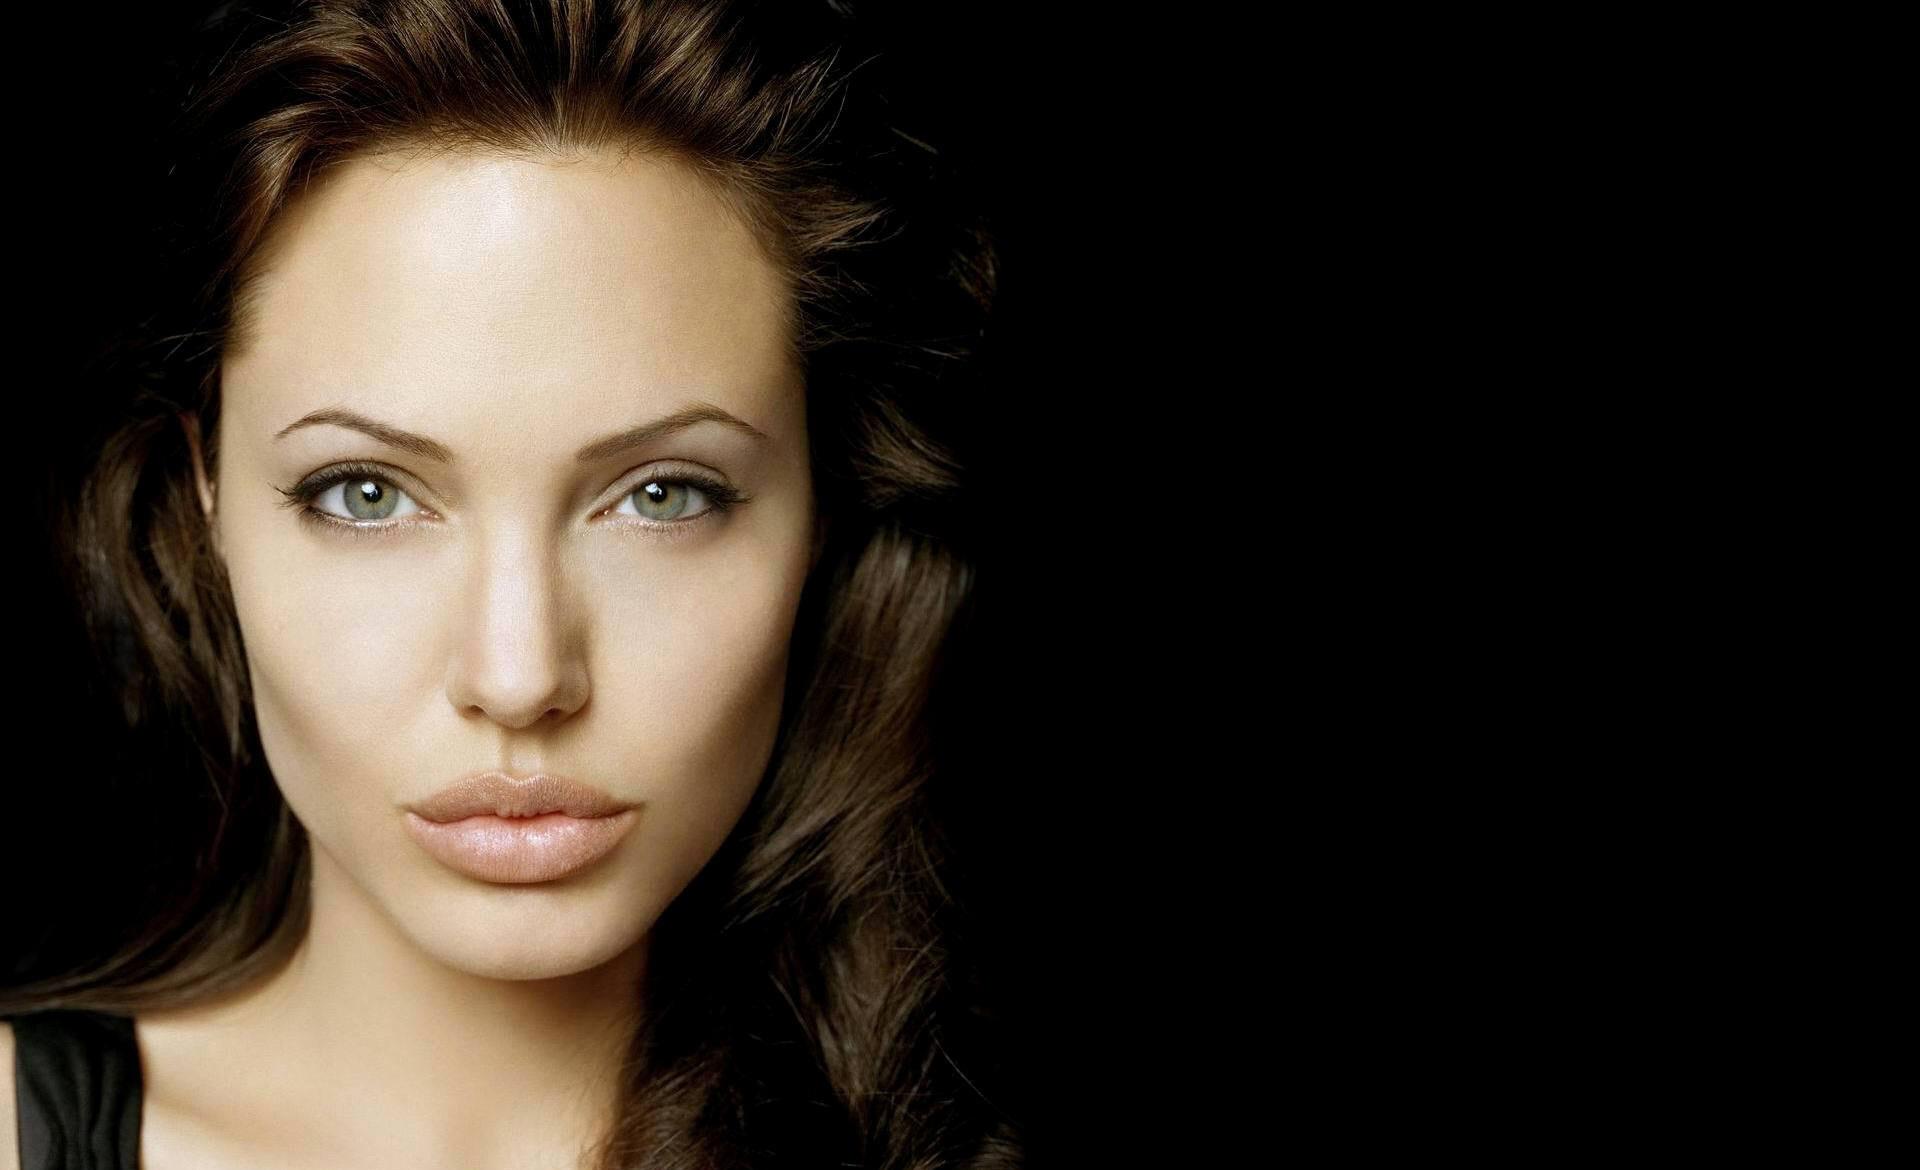 Tatuajes Angelina Jolie Espalda Famosas Fotos Kamistad Celebrity